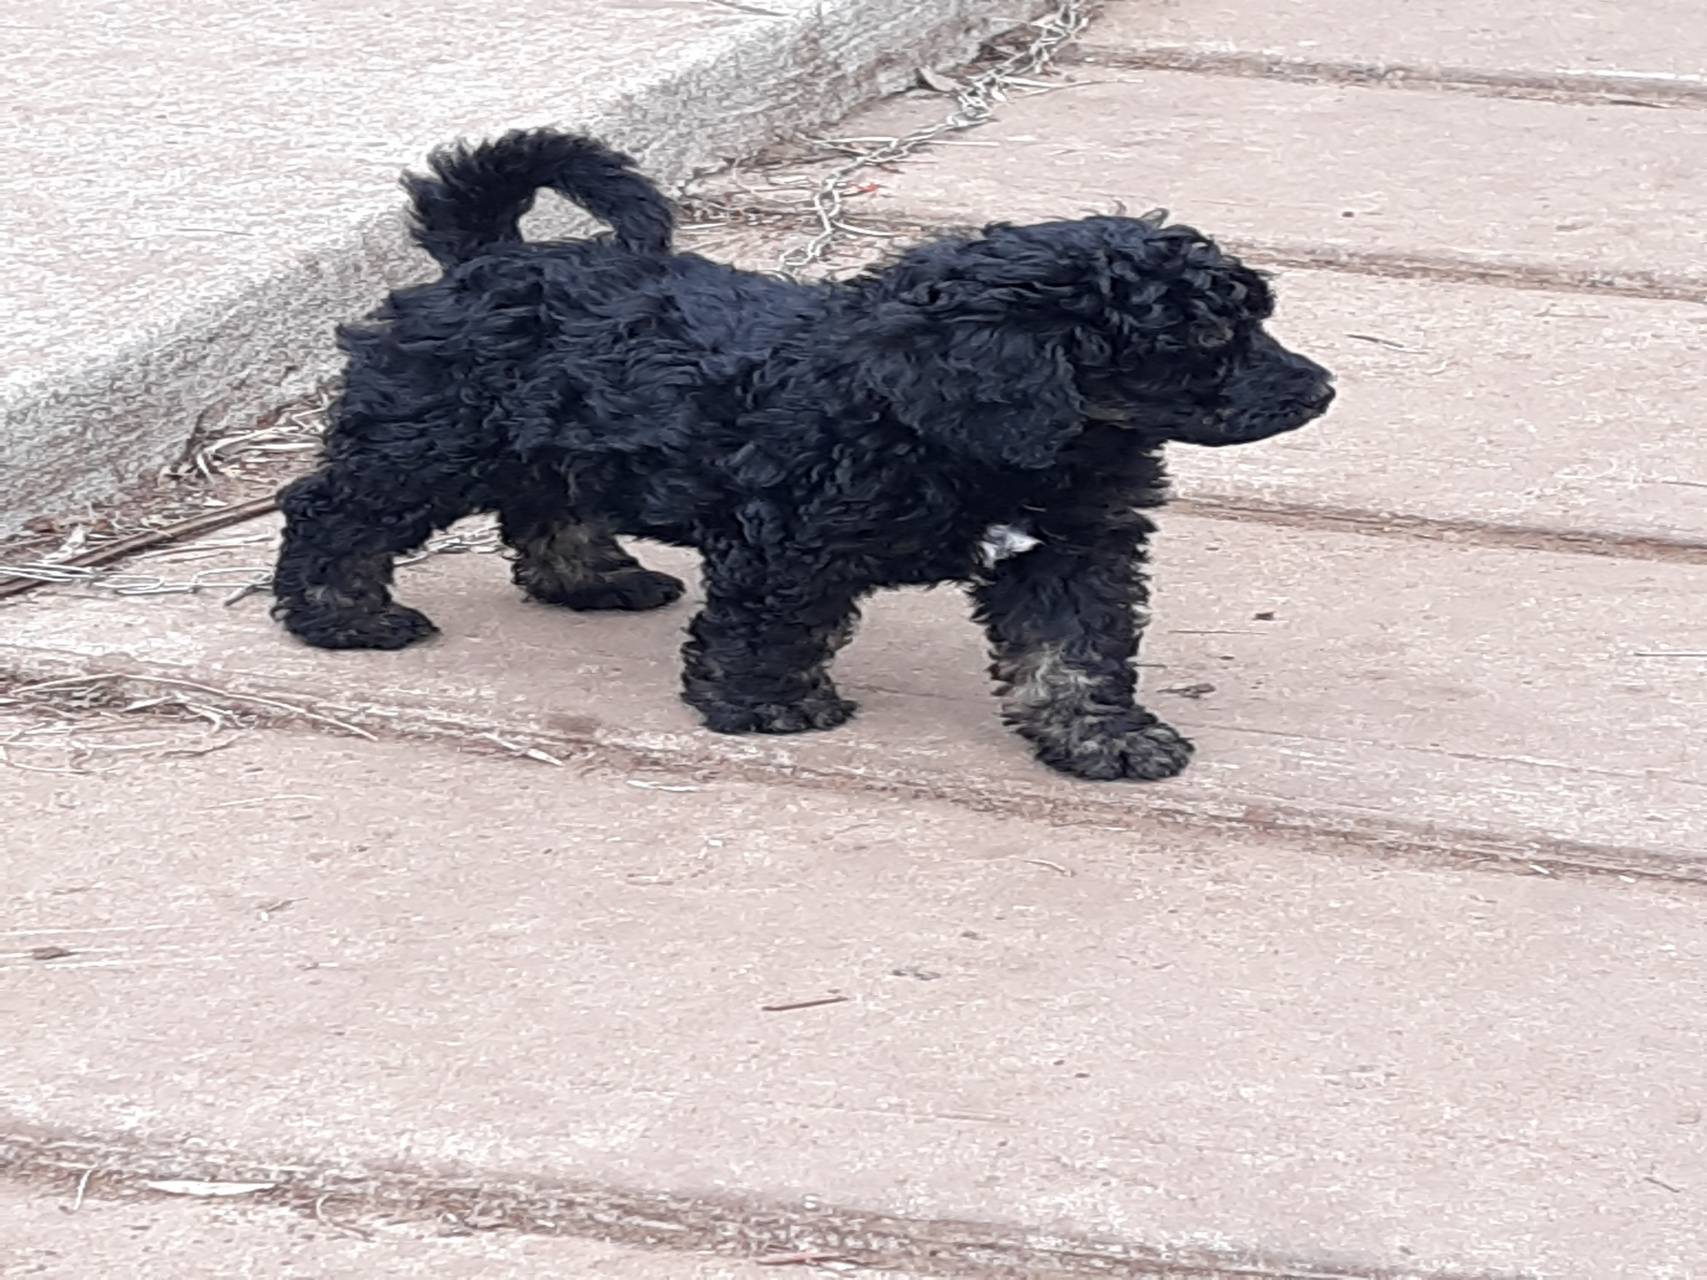 Phantom Poodle puppy